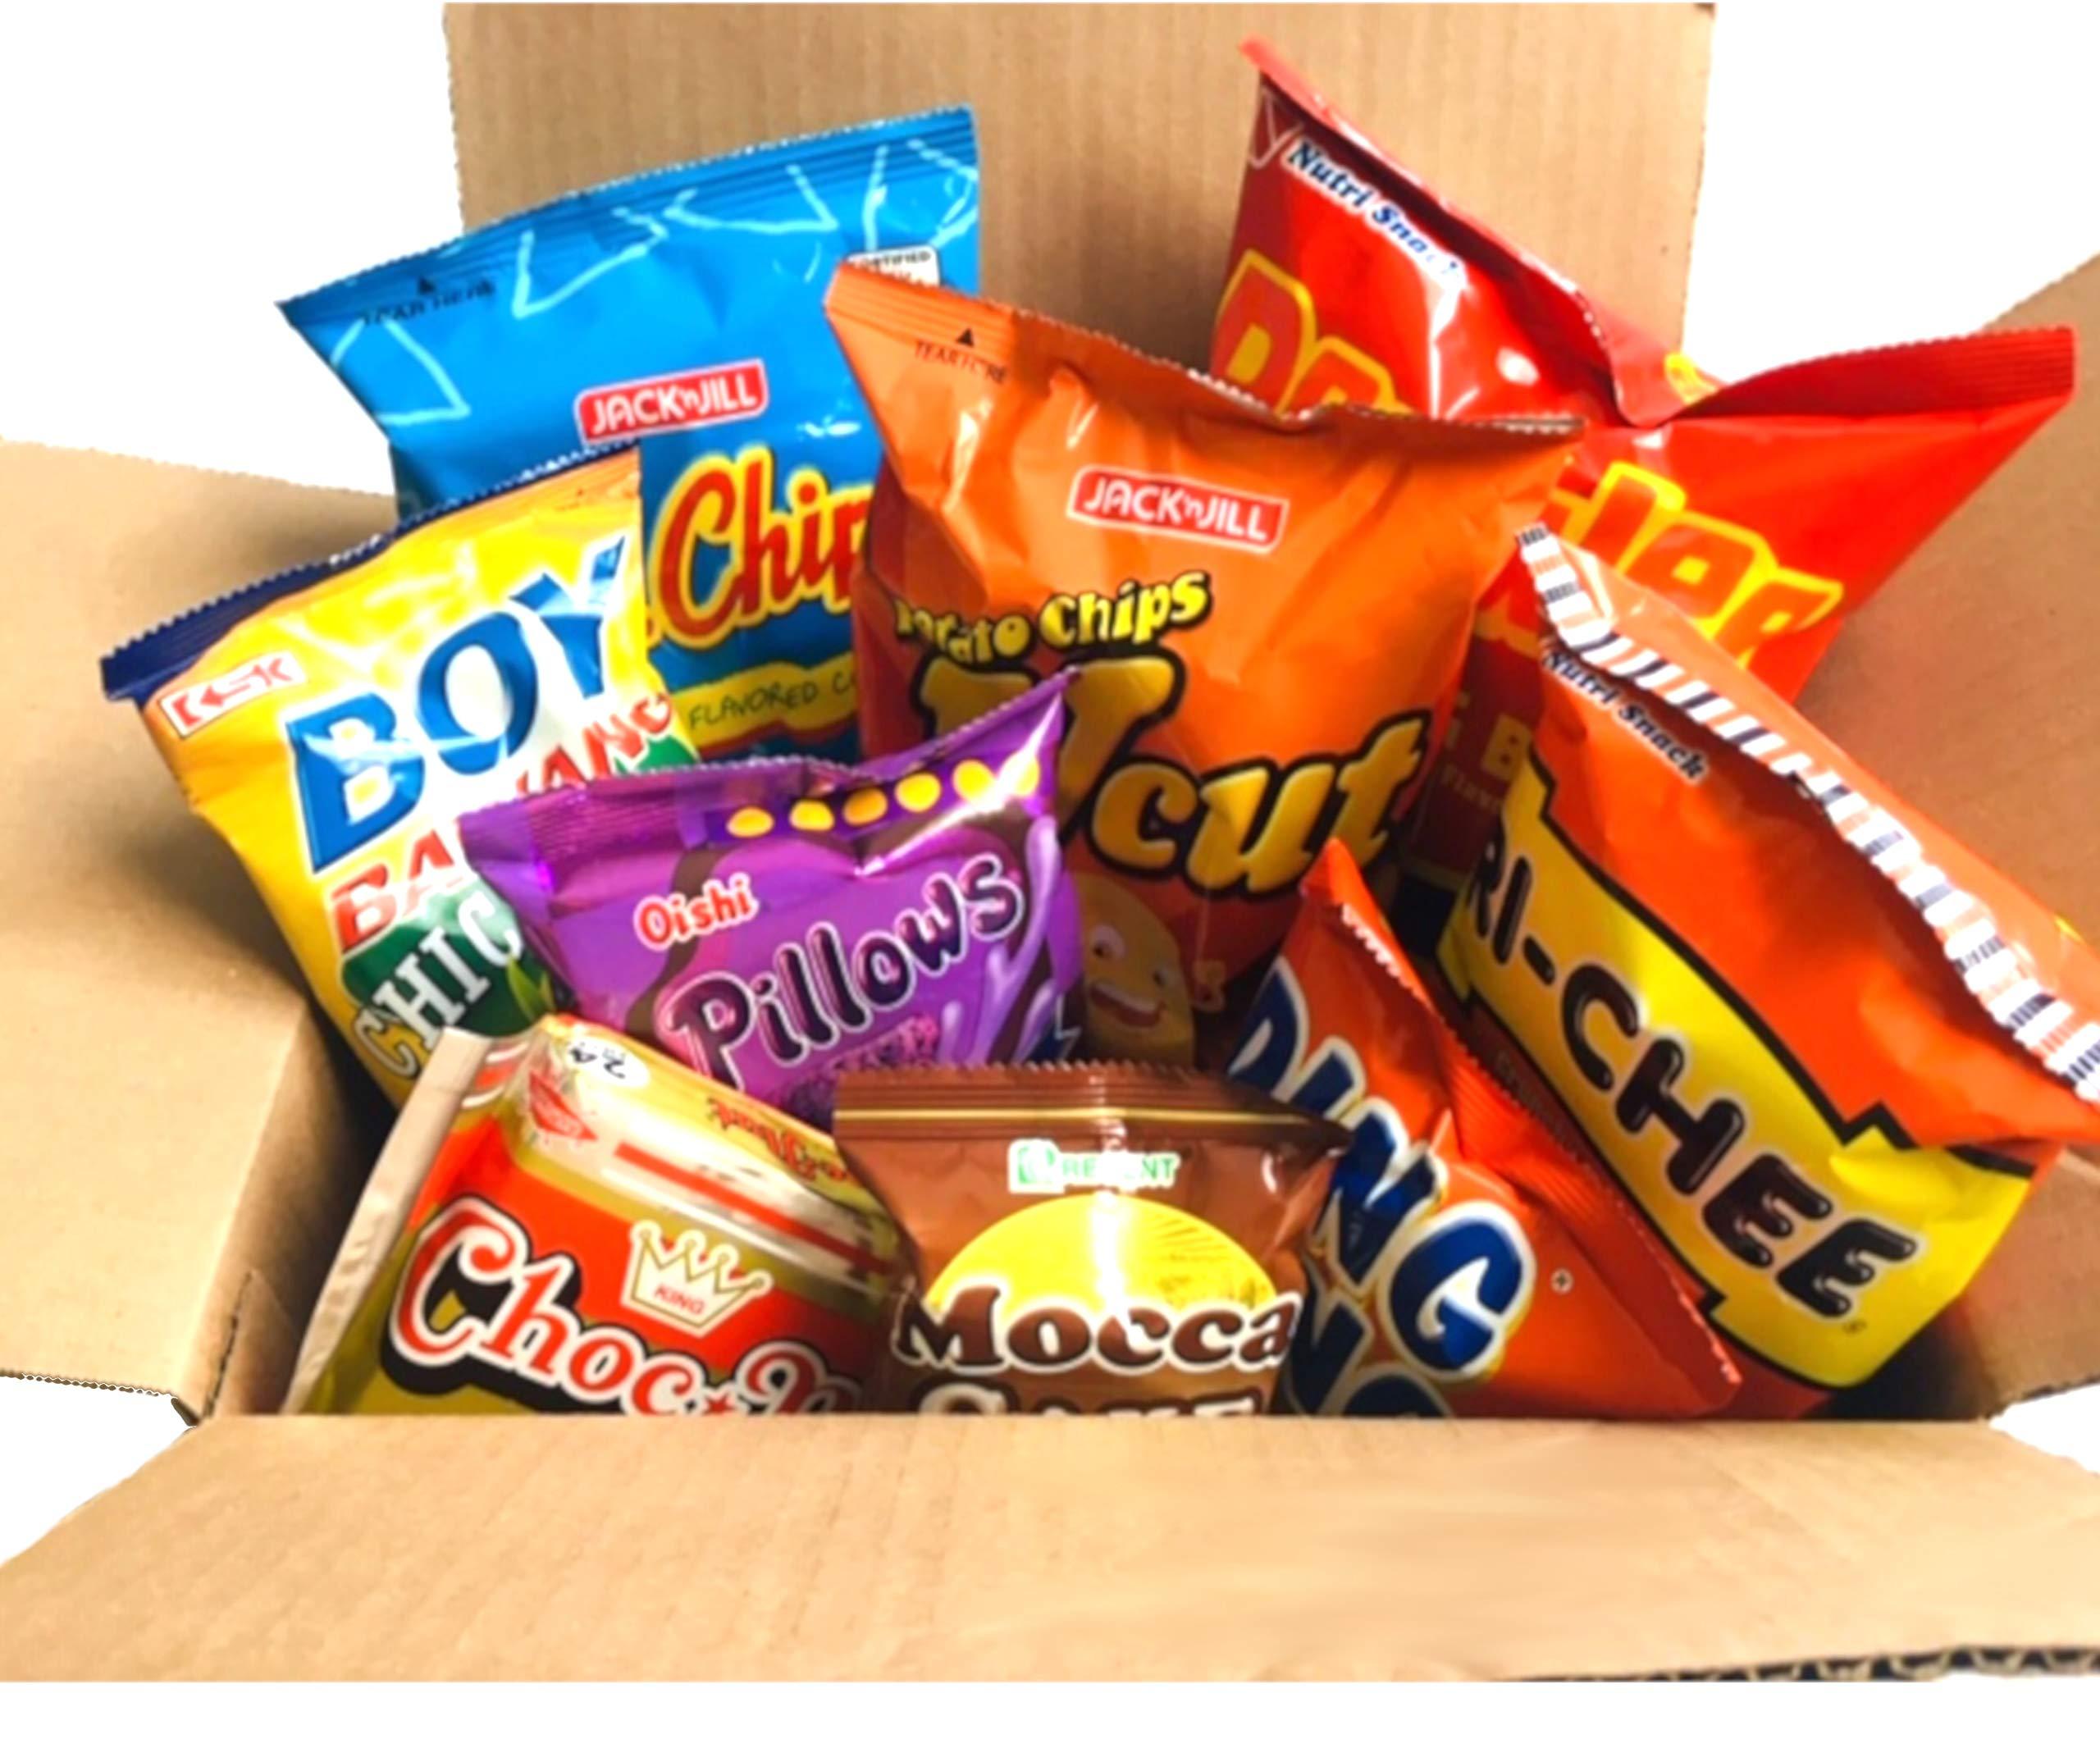 World Food Mission Classic Filipino Snacks Box (Variety 1, 9 pieces)